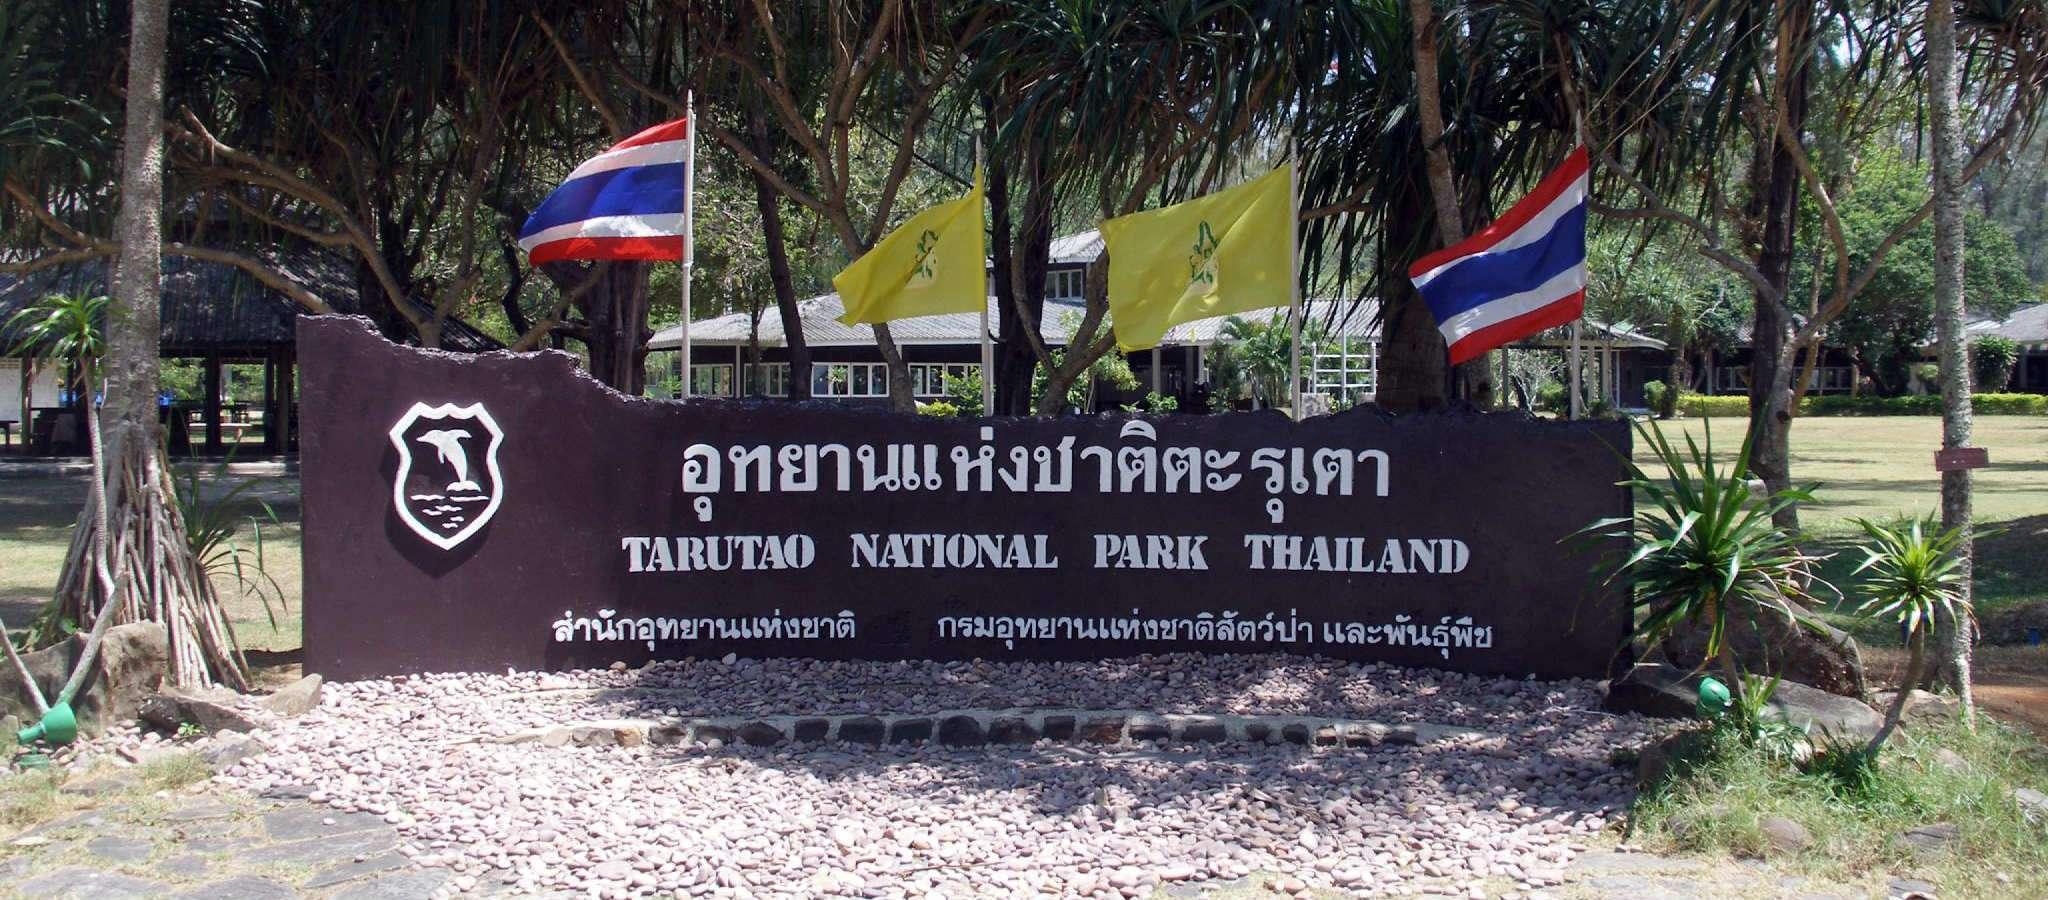 Tarutao National Park sign